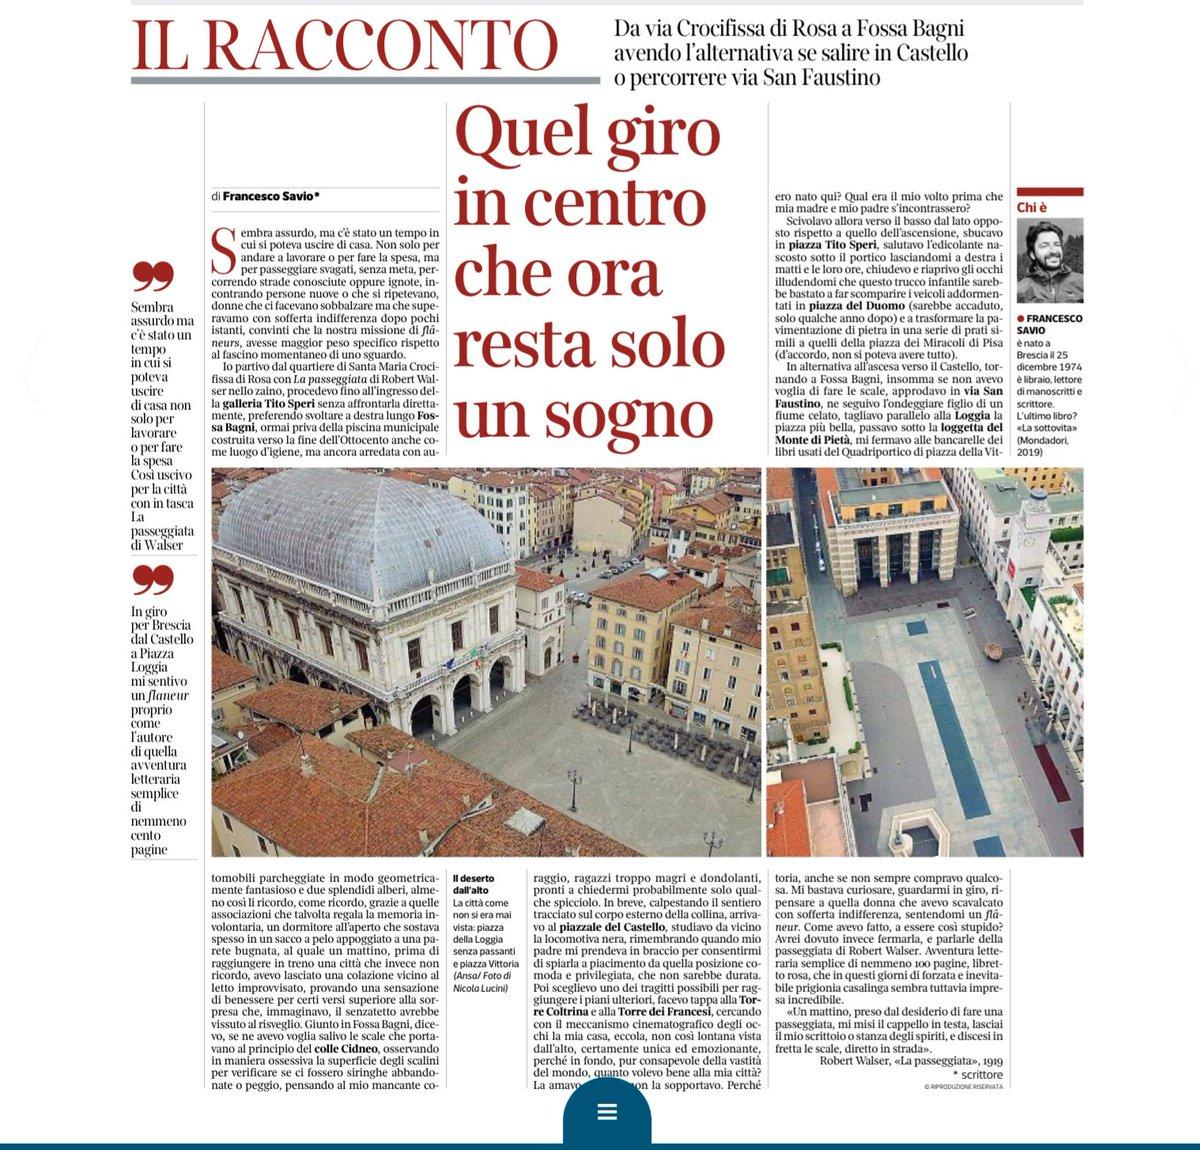 Bagni D Autore Brescia francesco savio (@francescosavio) | twitter